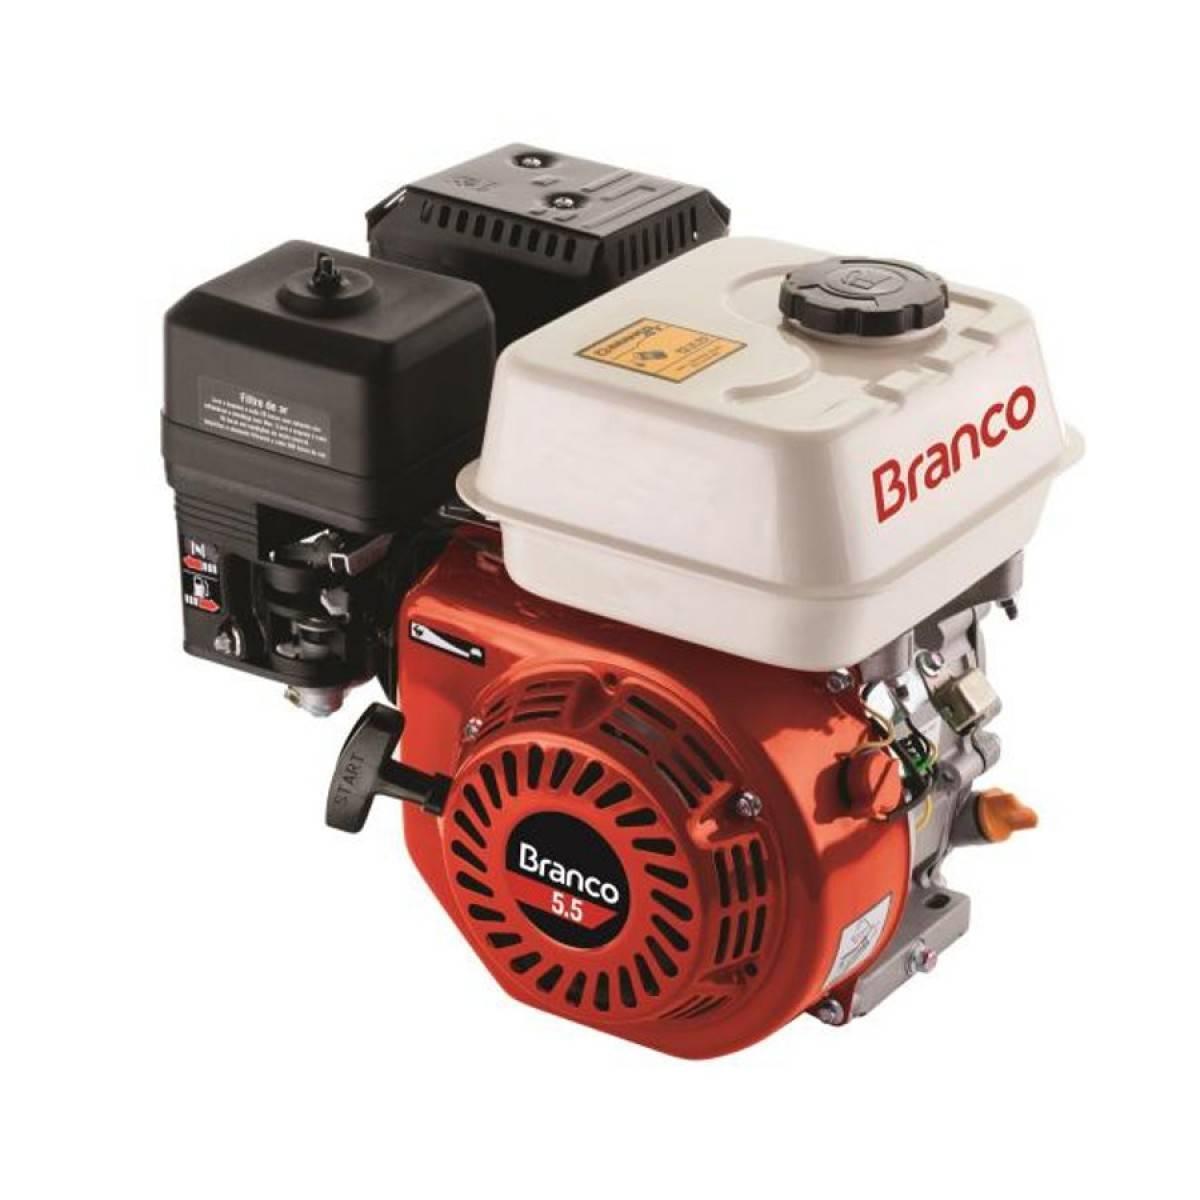 Motor Branco B4T 6,5CV eixo Horizontal C/ redutor 2800 Rpm - BSS Maquinas